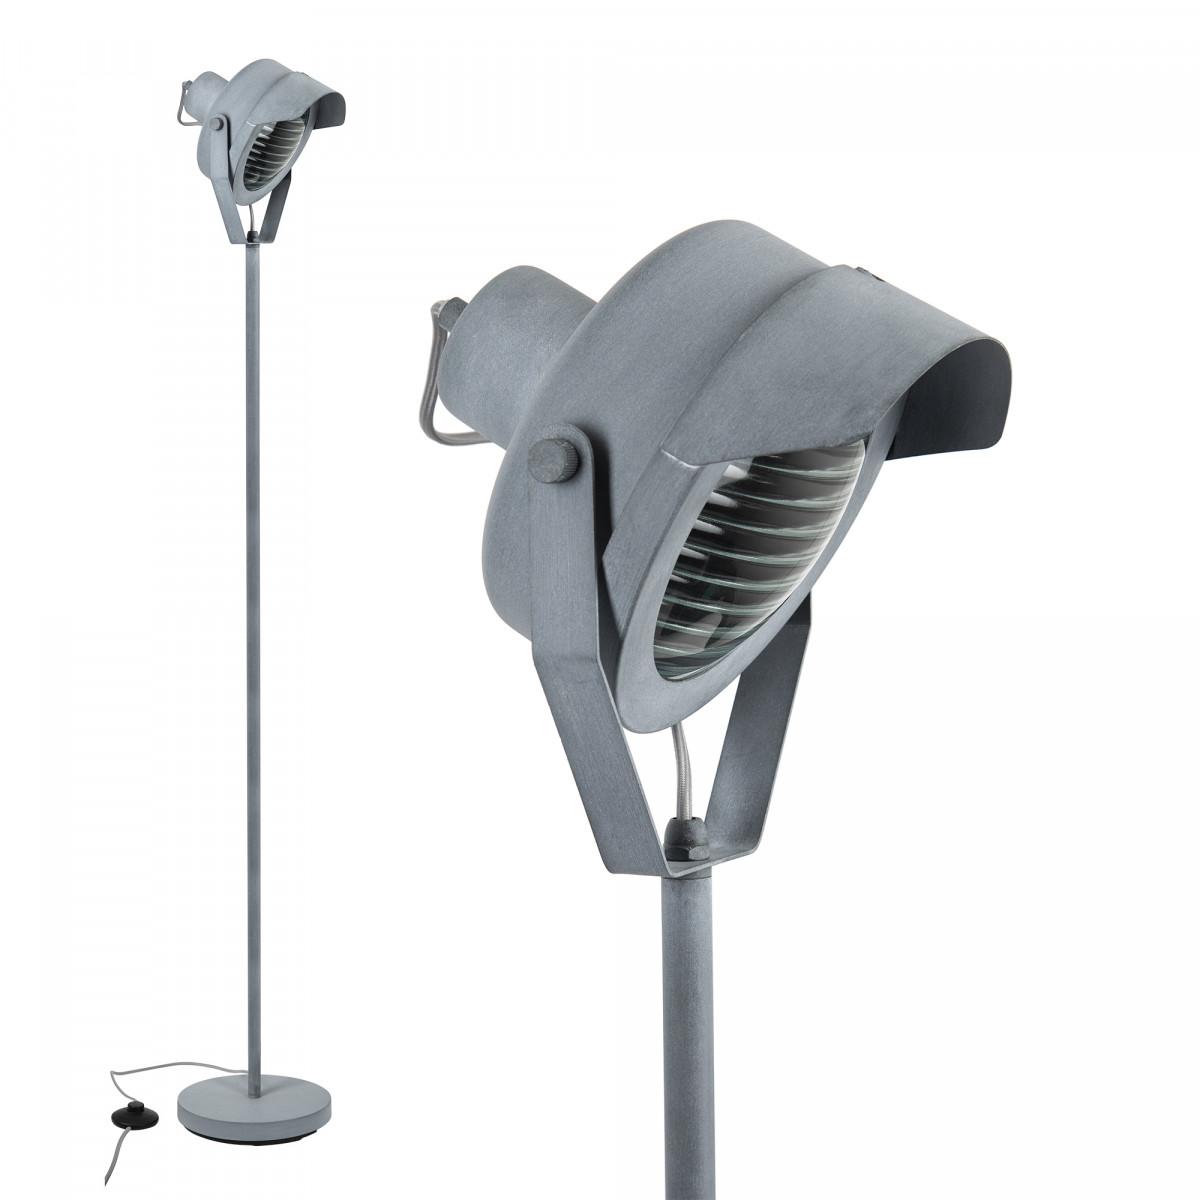 Stage vloerlamp